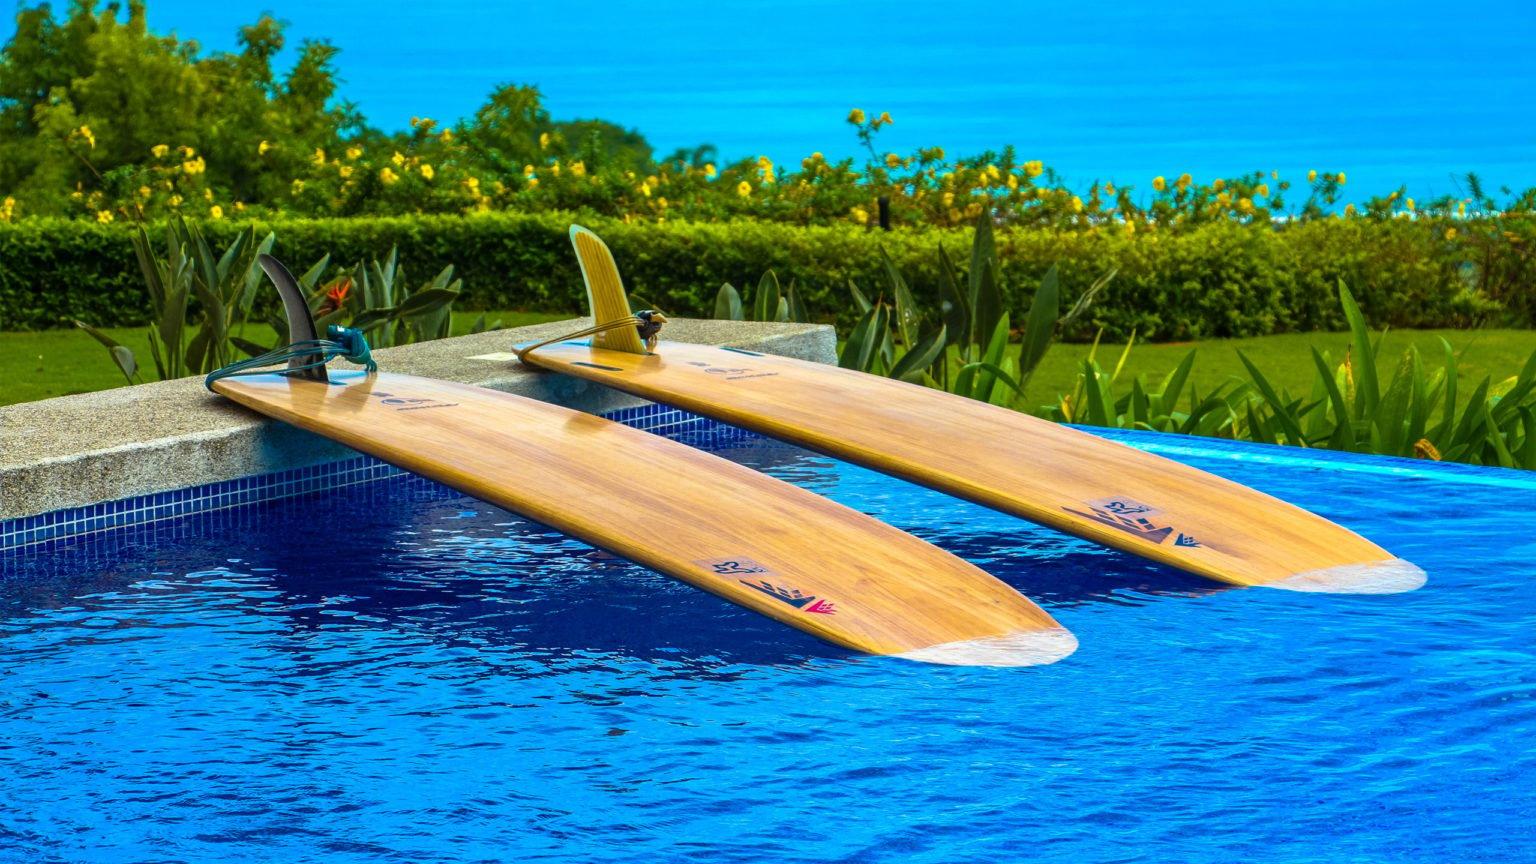 Firewire Surfboards Costa Rica Official Partners Kalon Surf